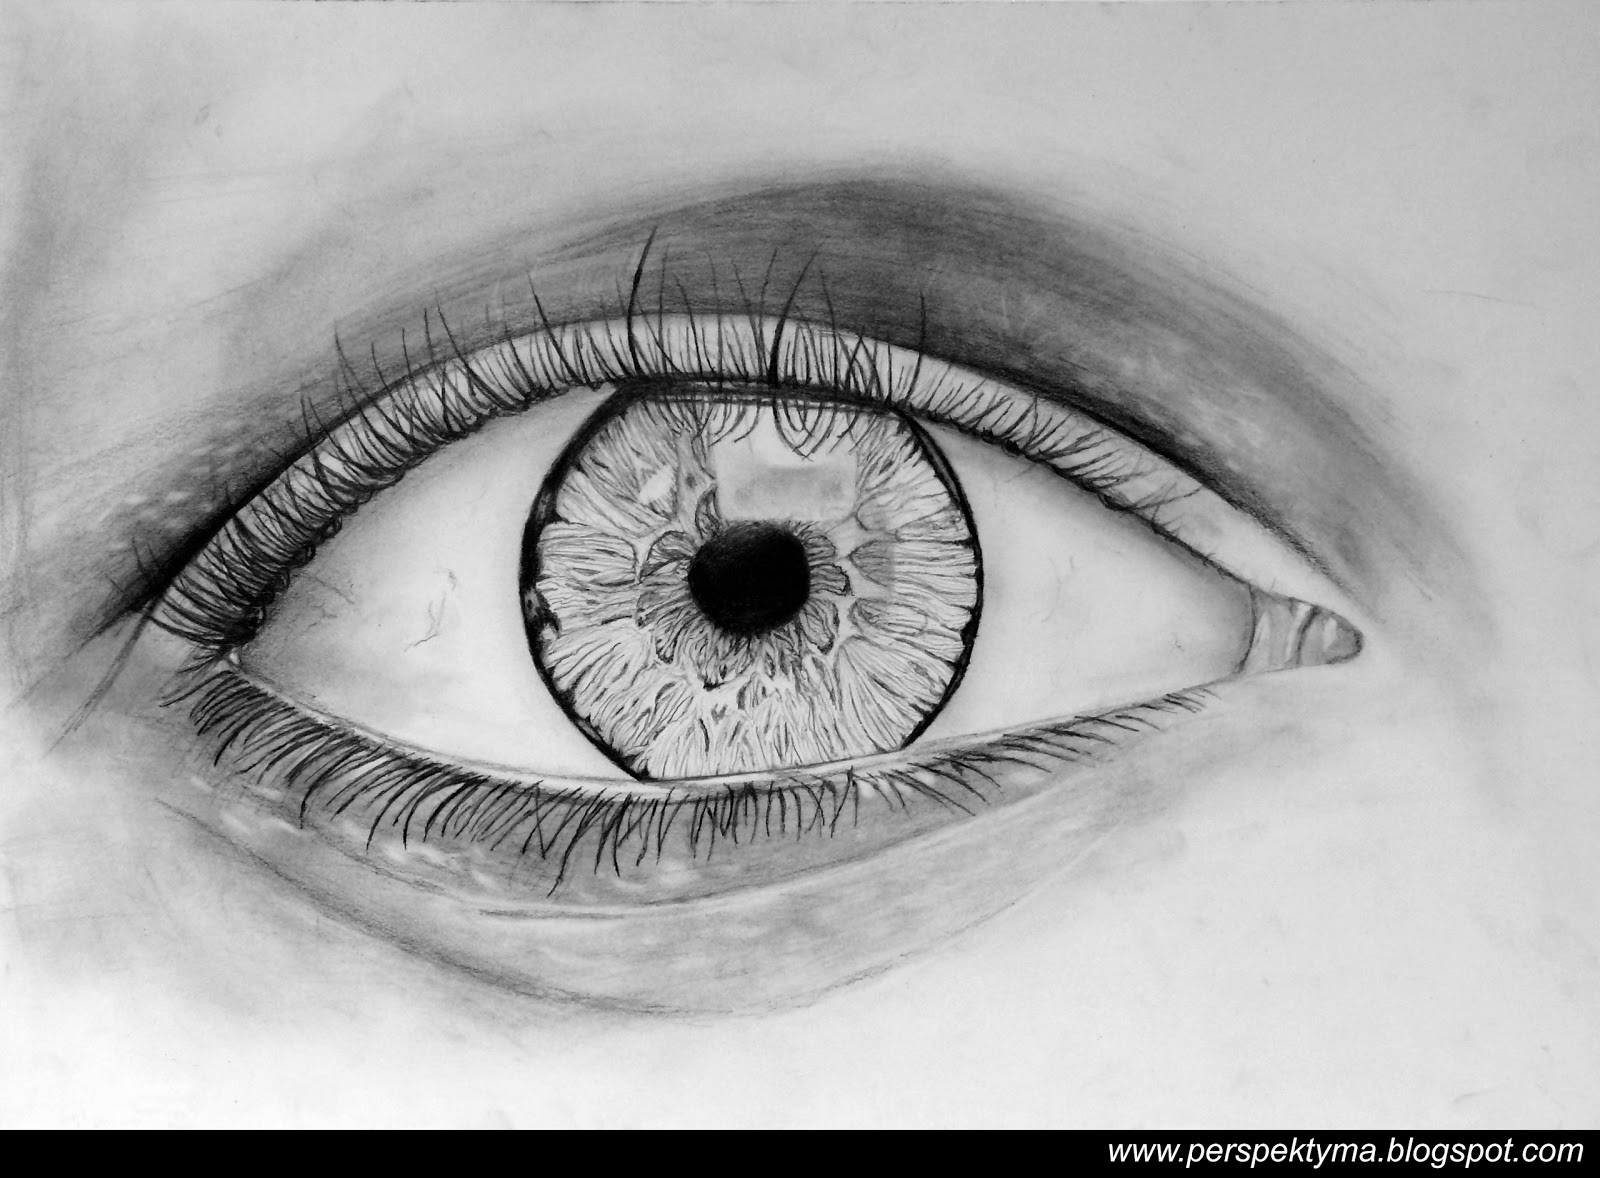 Perspektyma Rysunek Oka